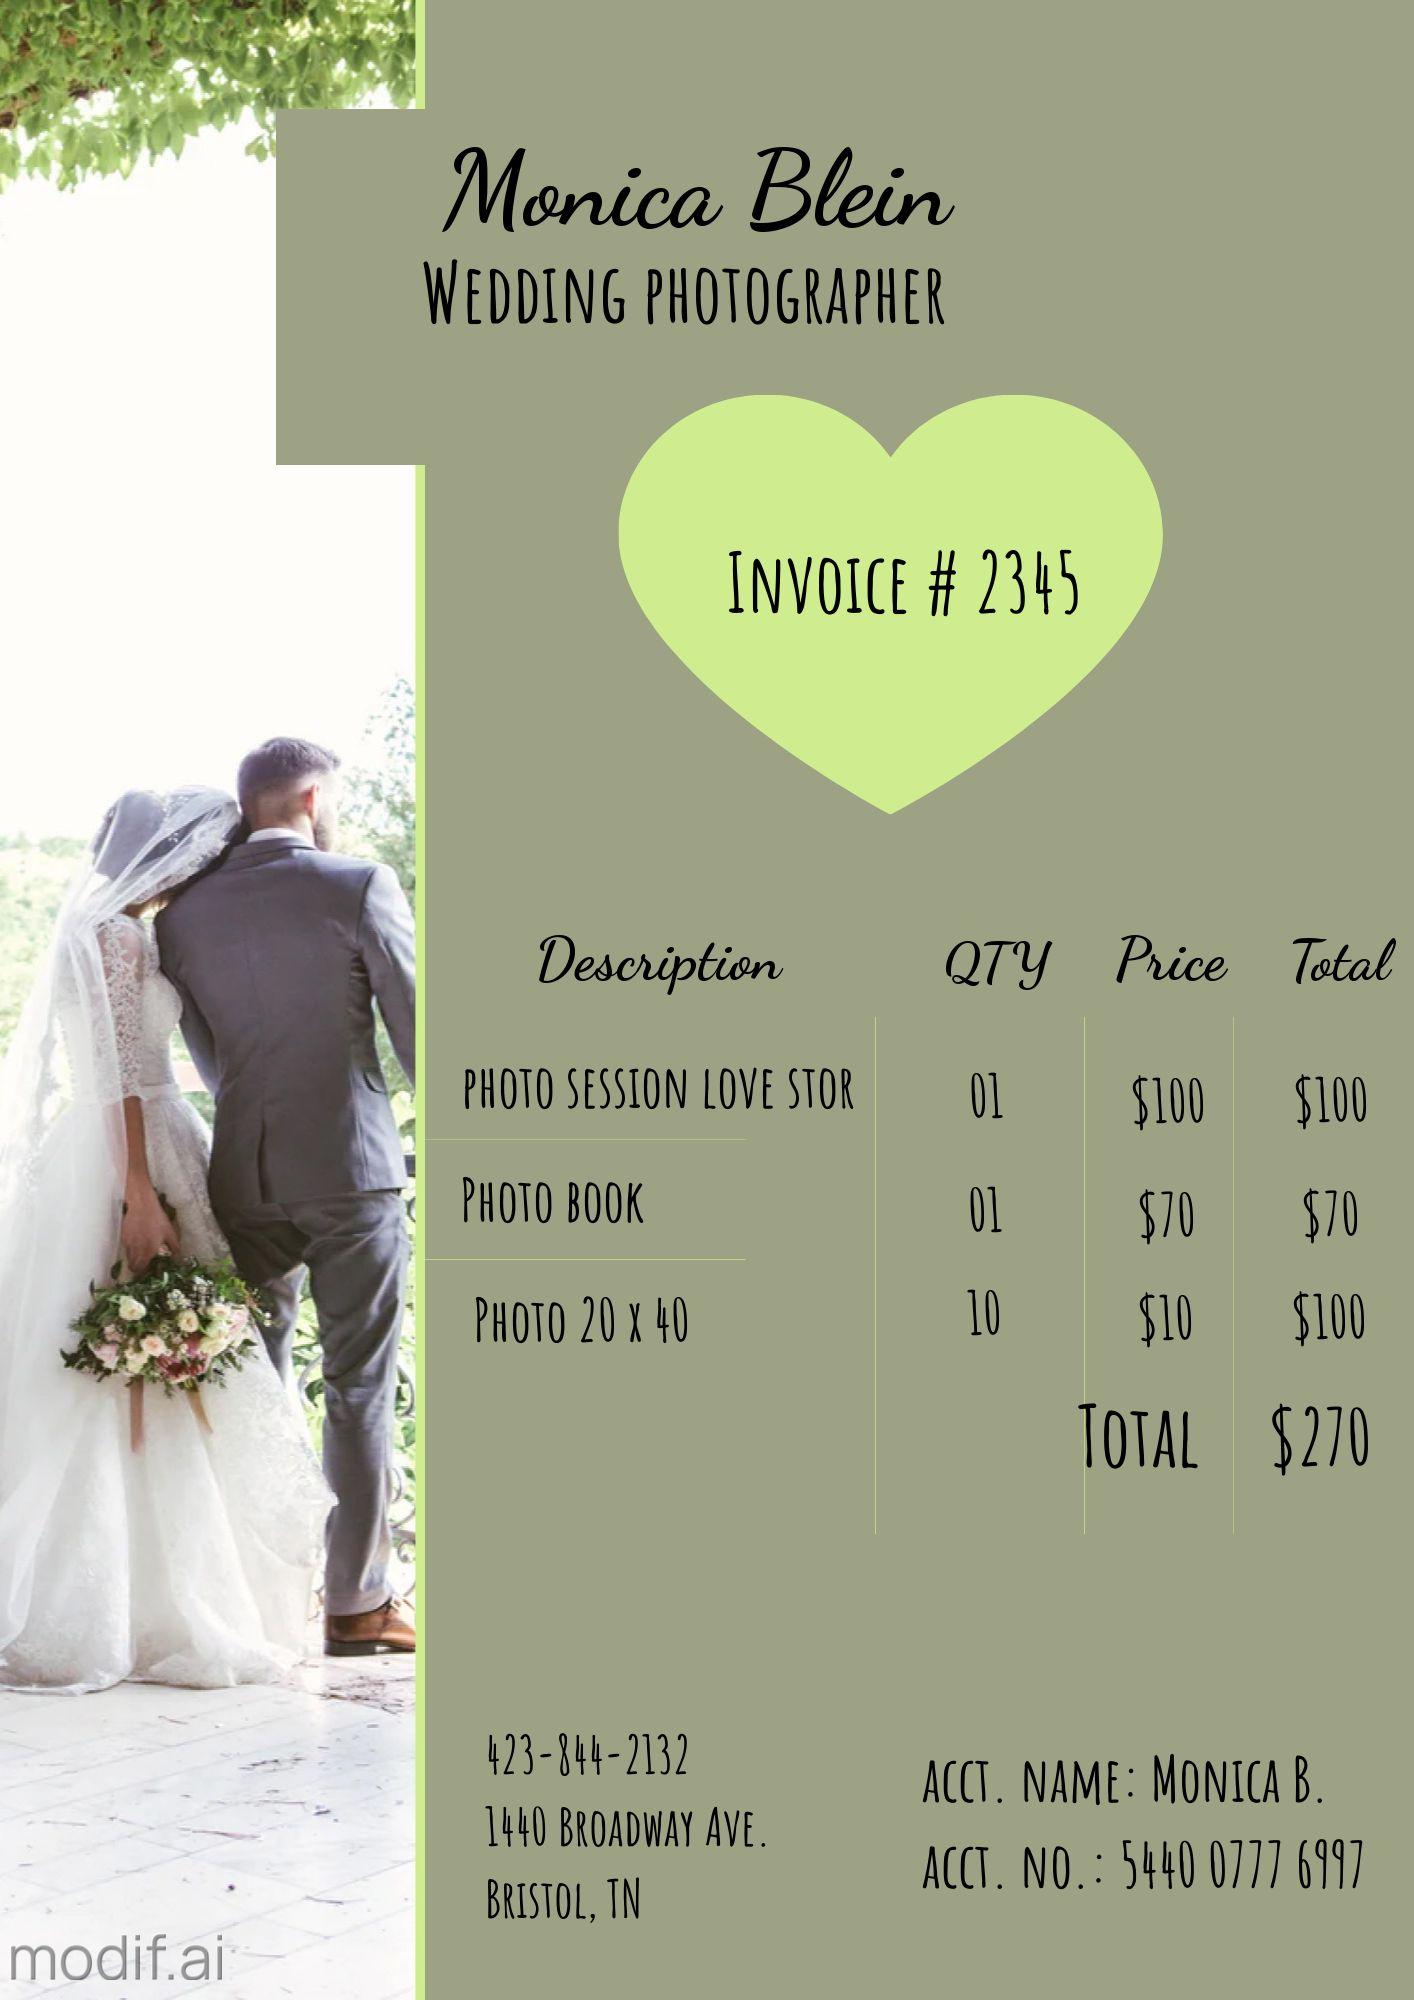 Wedding Photographer Invoice Template